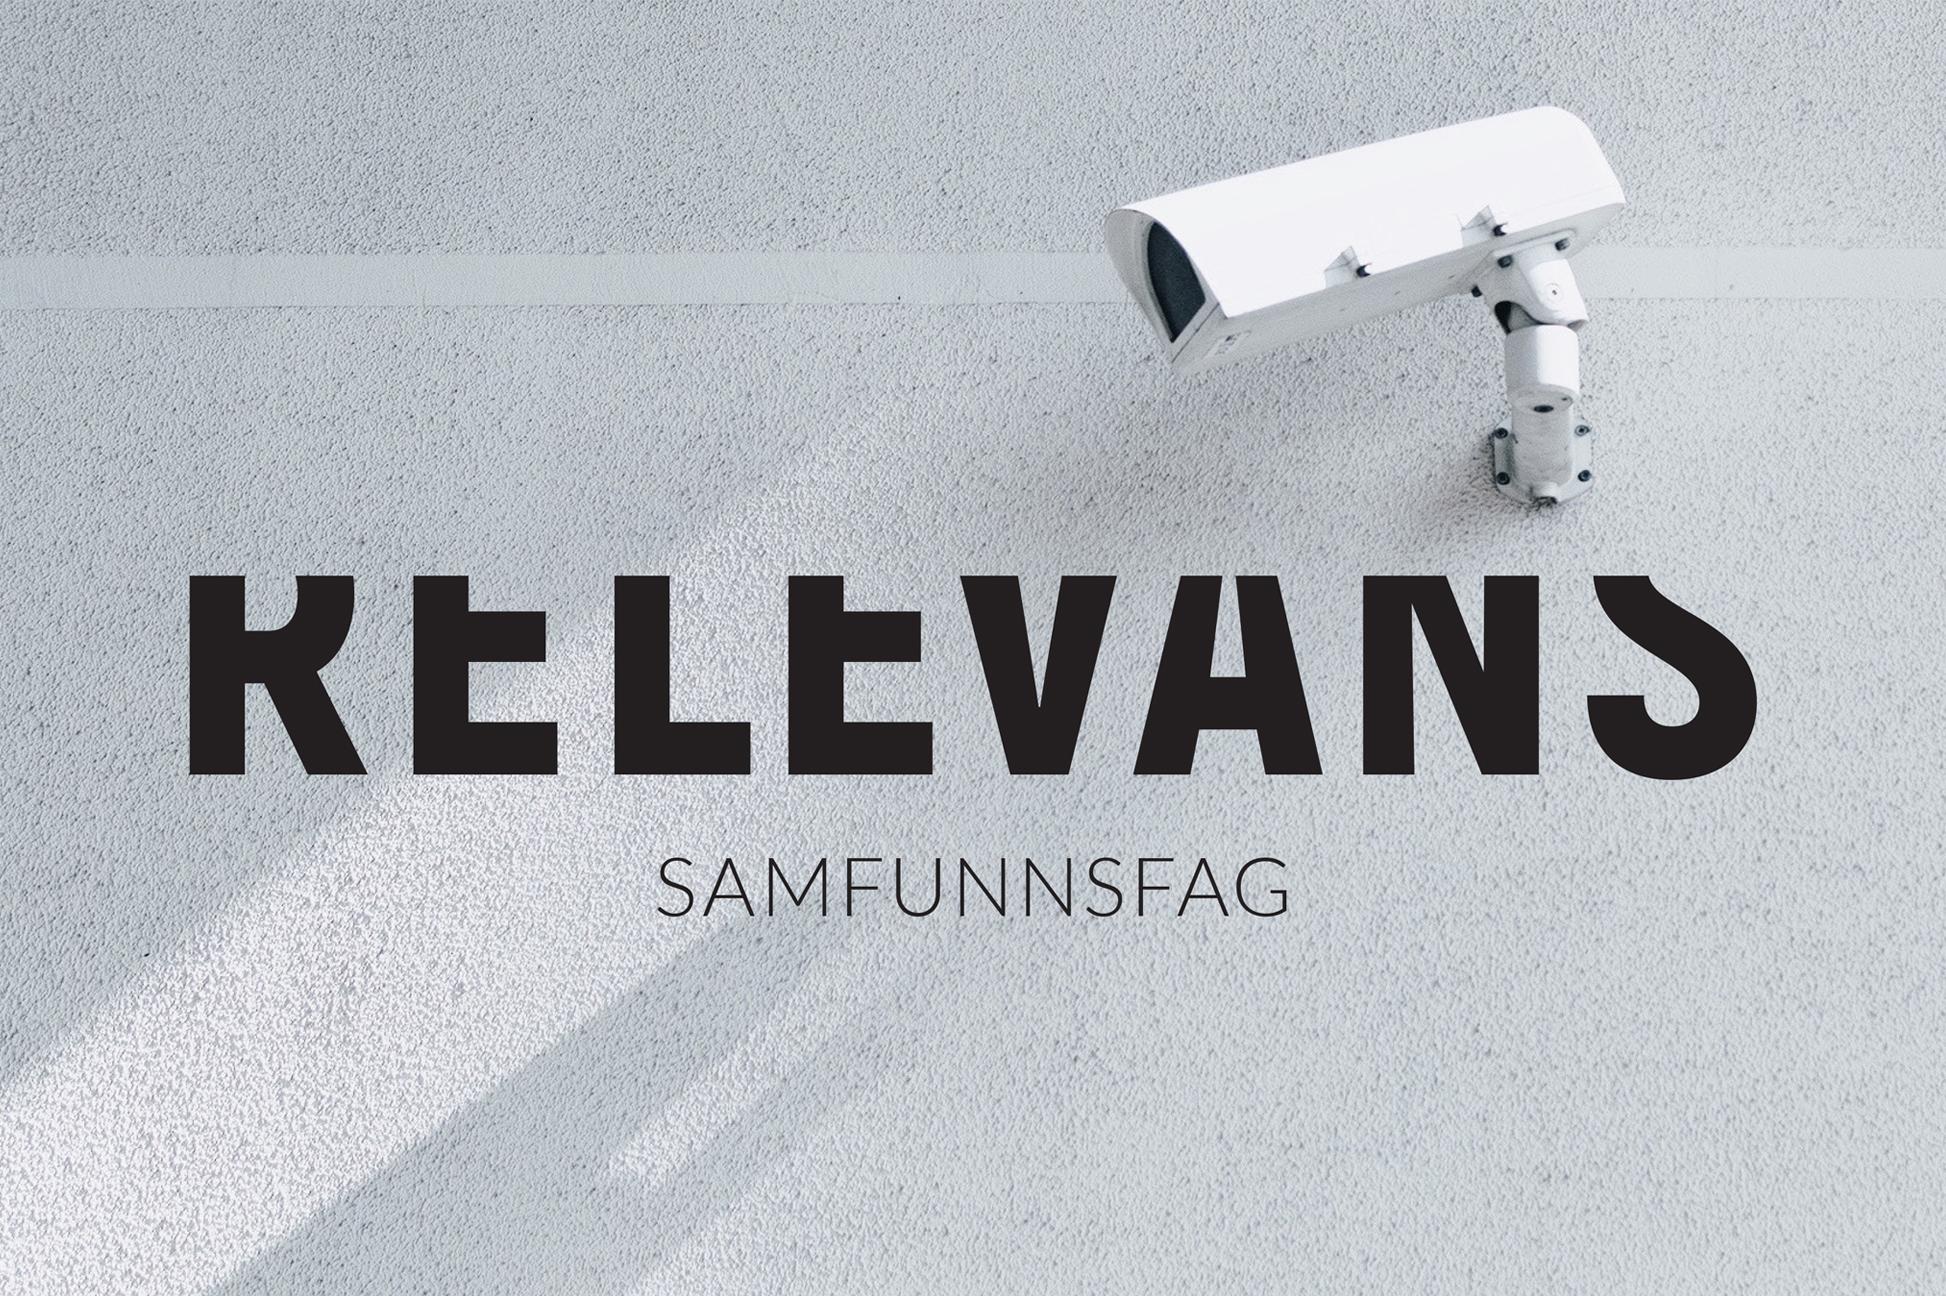 Relevans-logo i sort på foto av overvåkningskamera.